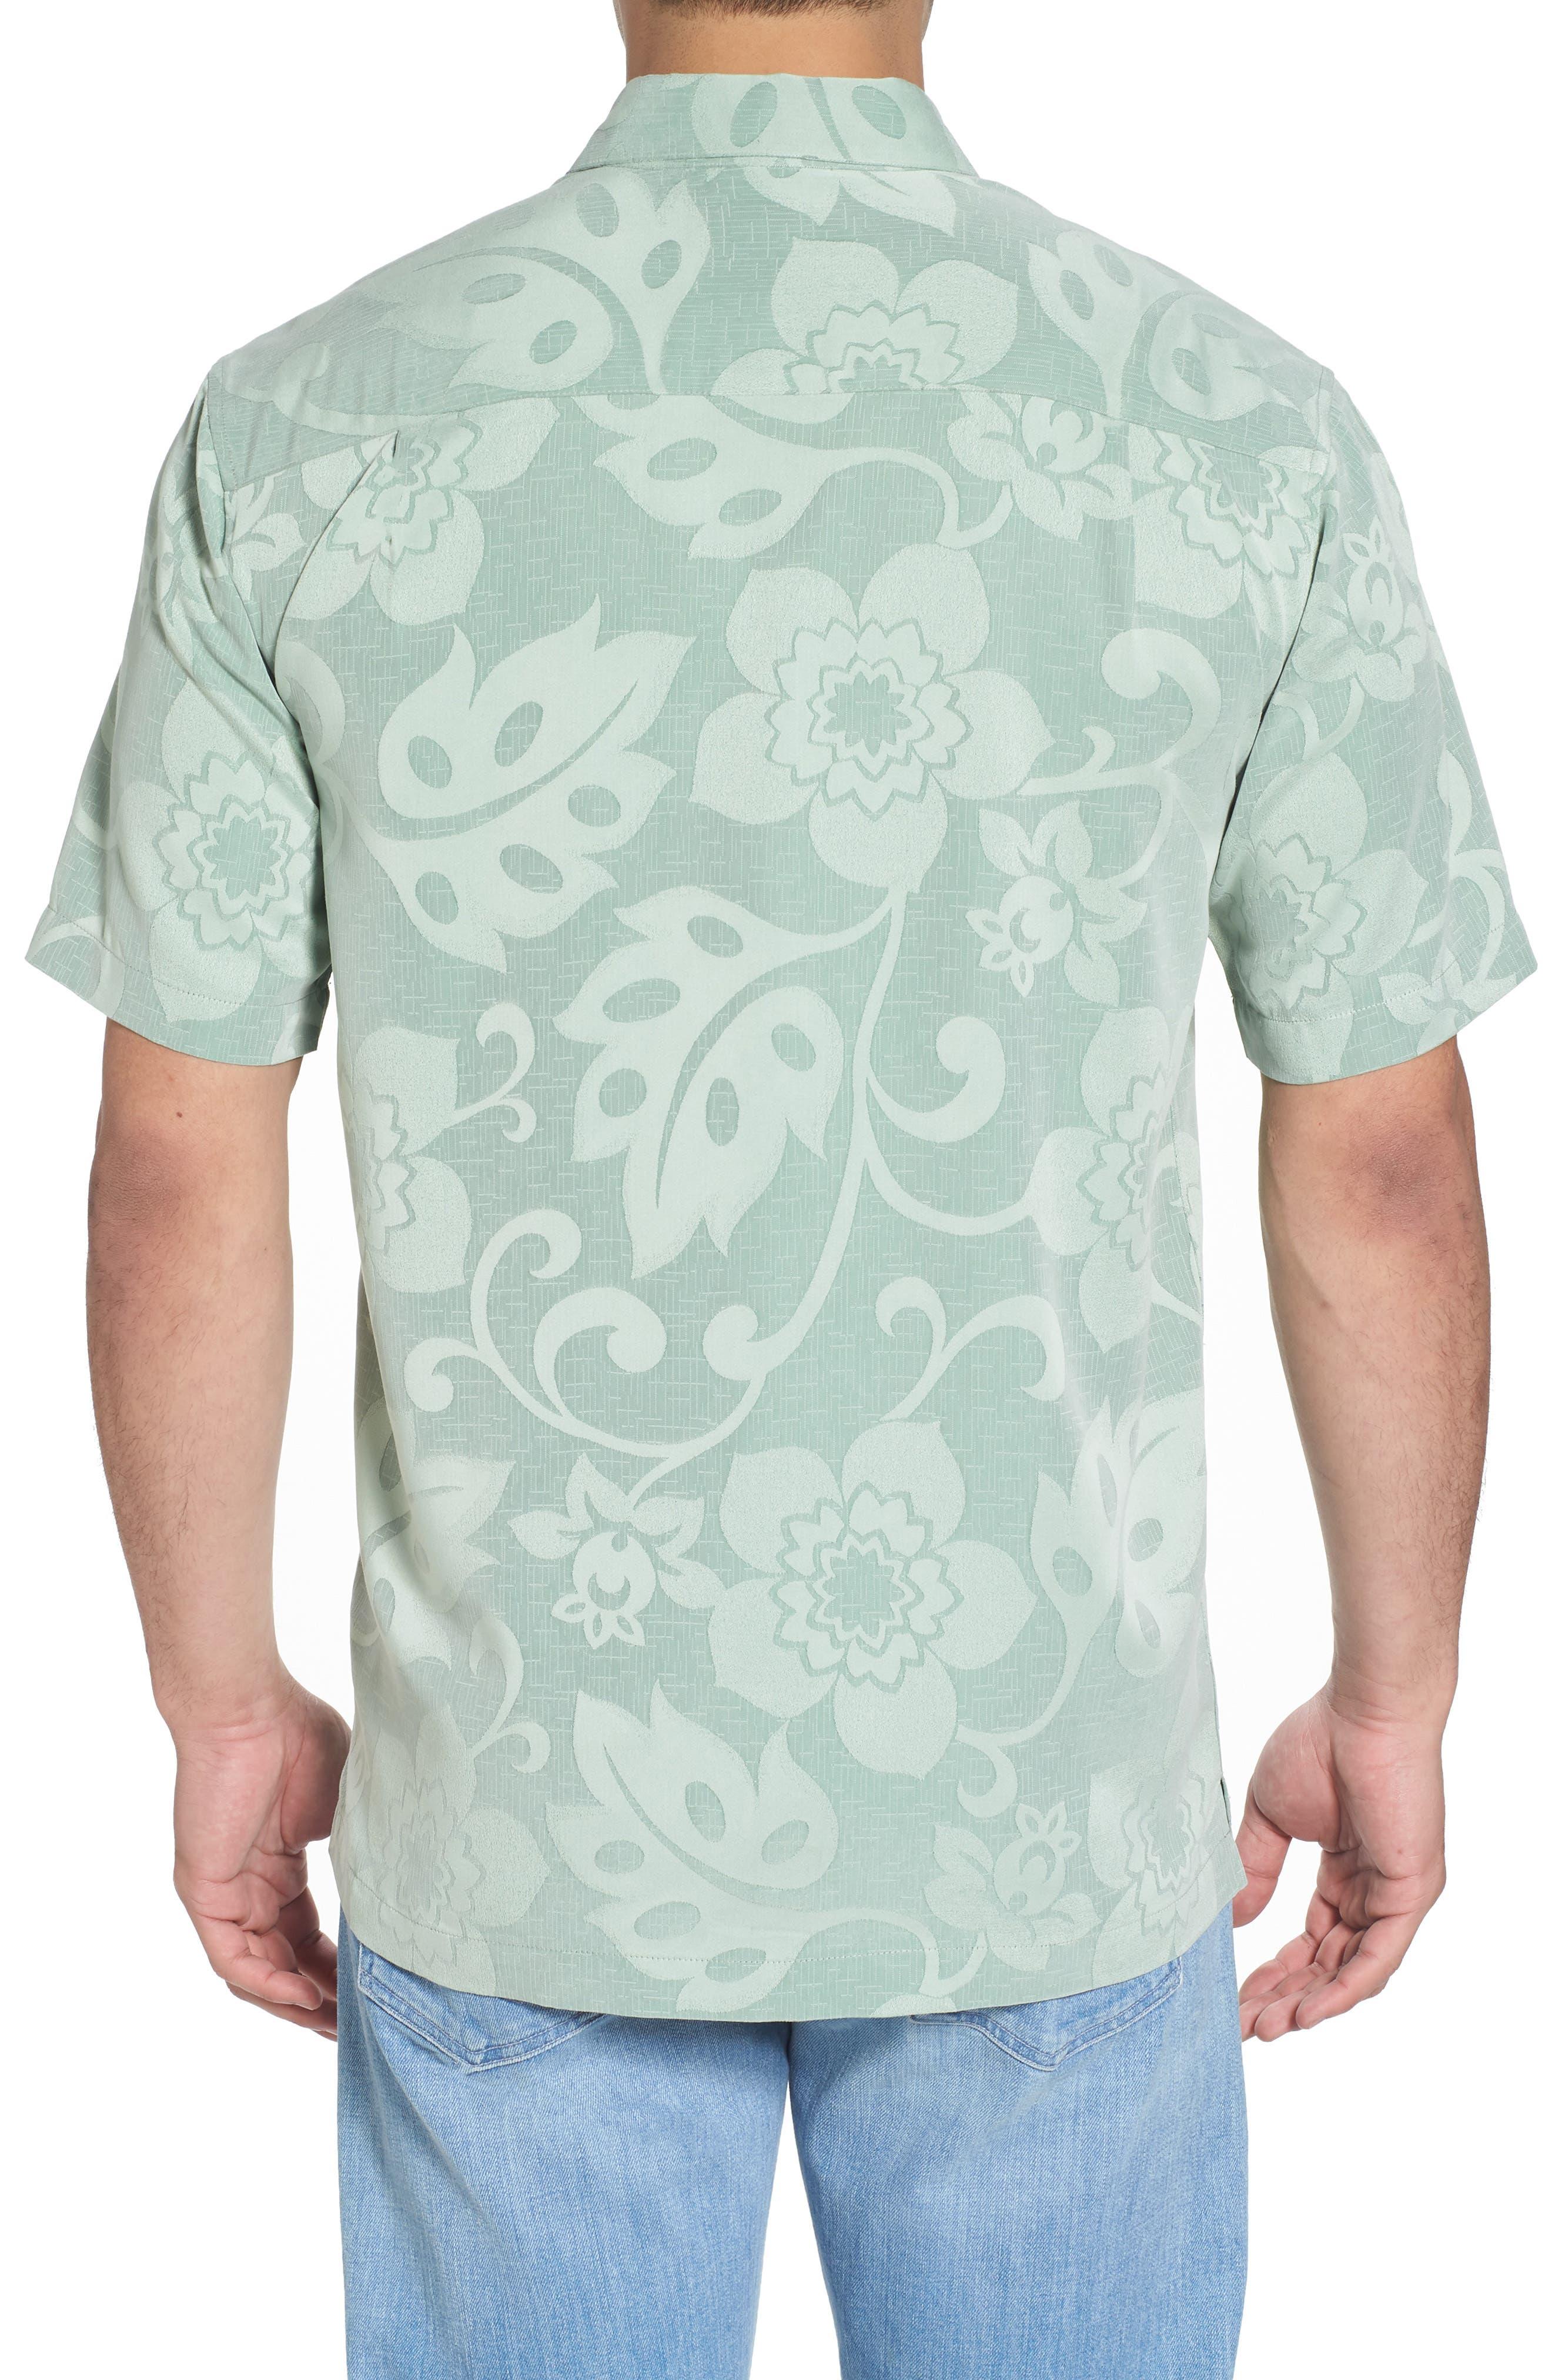 Kalawai Relaxed Fit Camp Shirt,                             Alternate thumbnail 2, color,                             Green